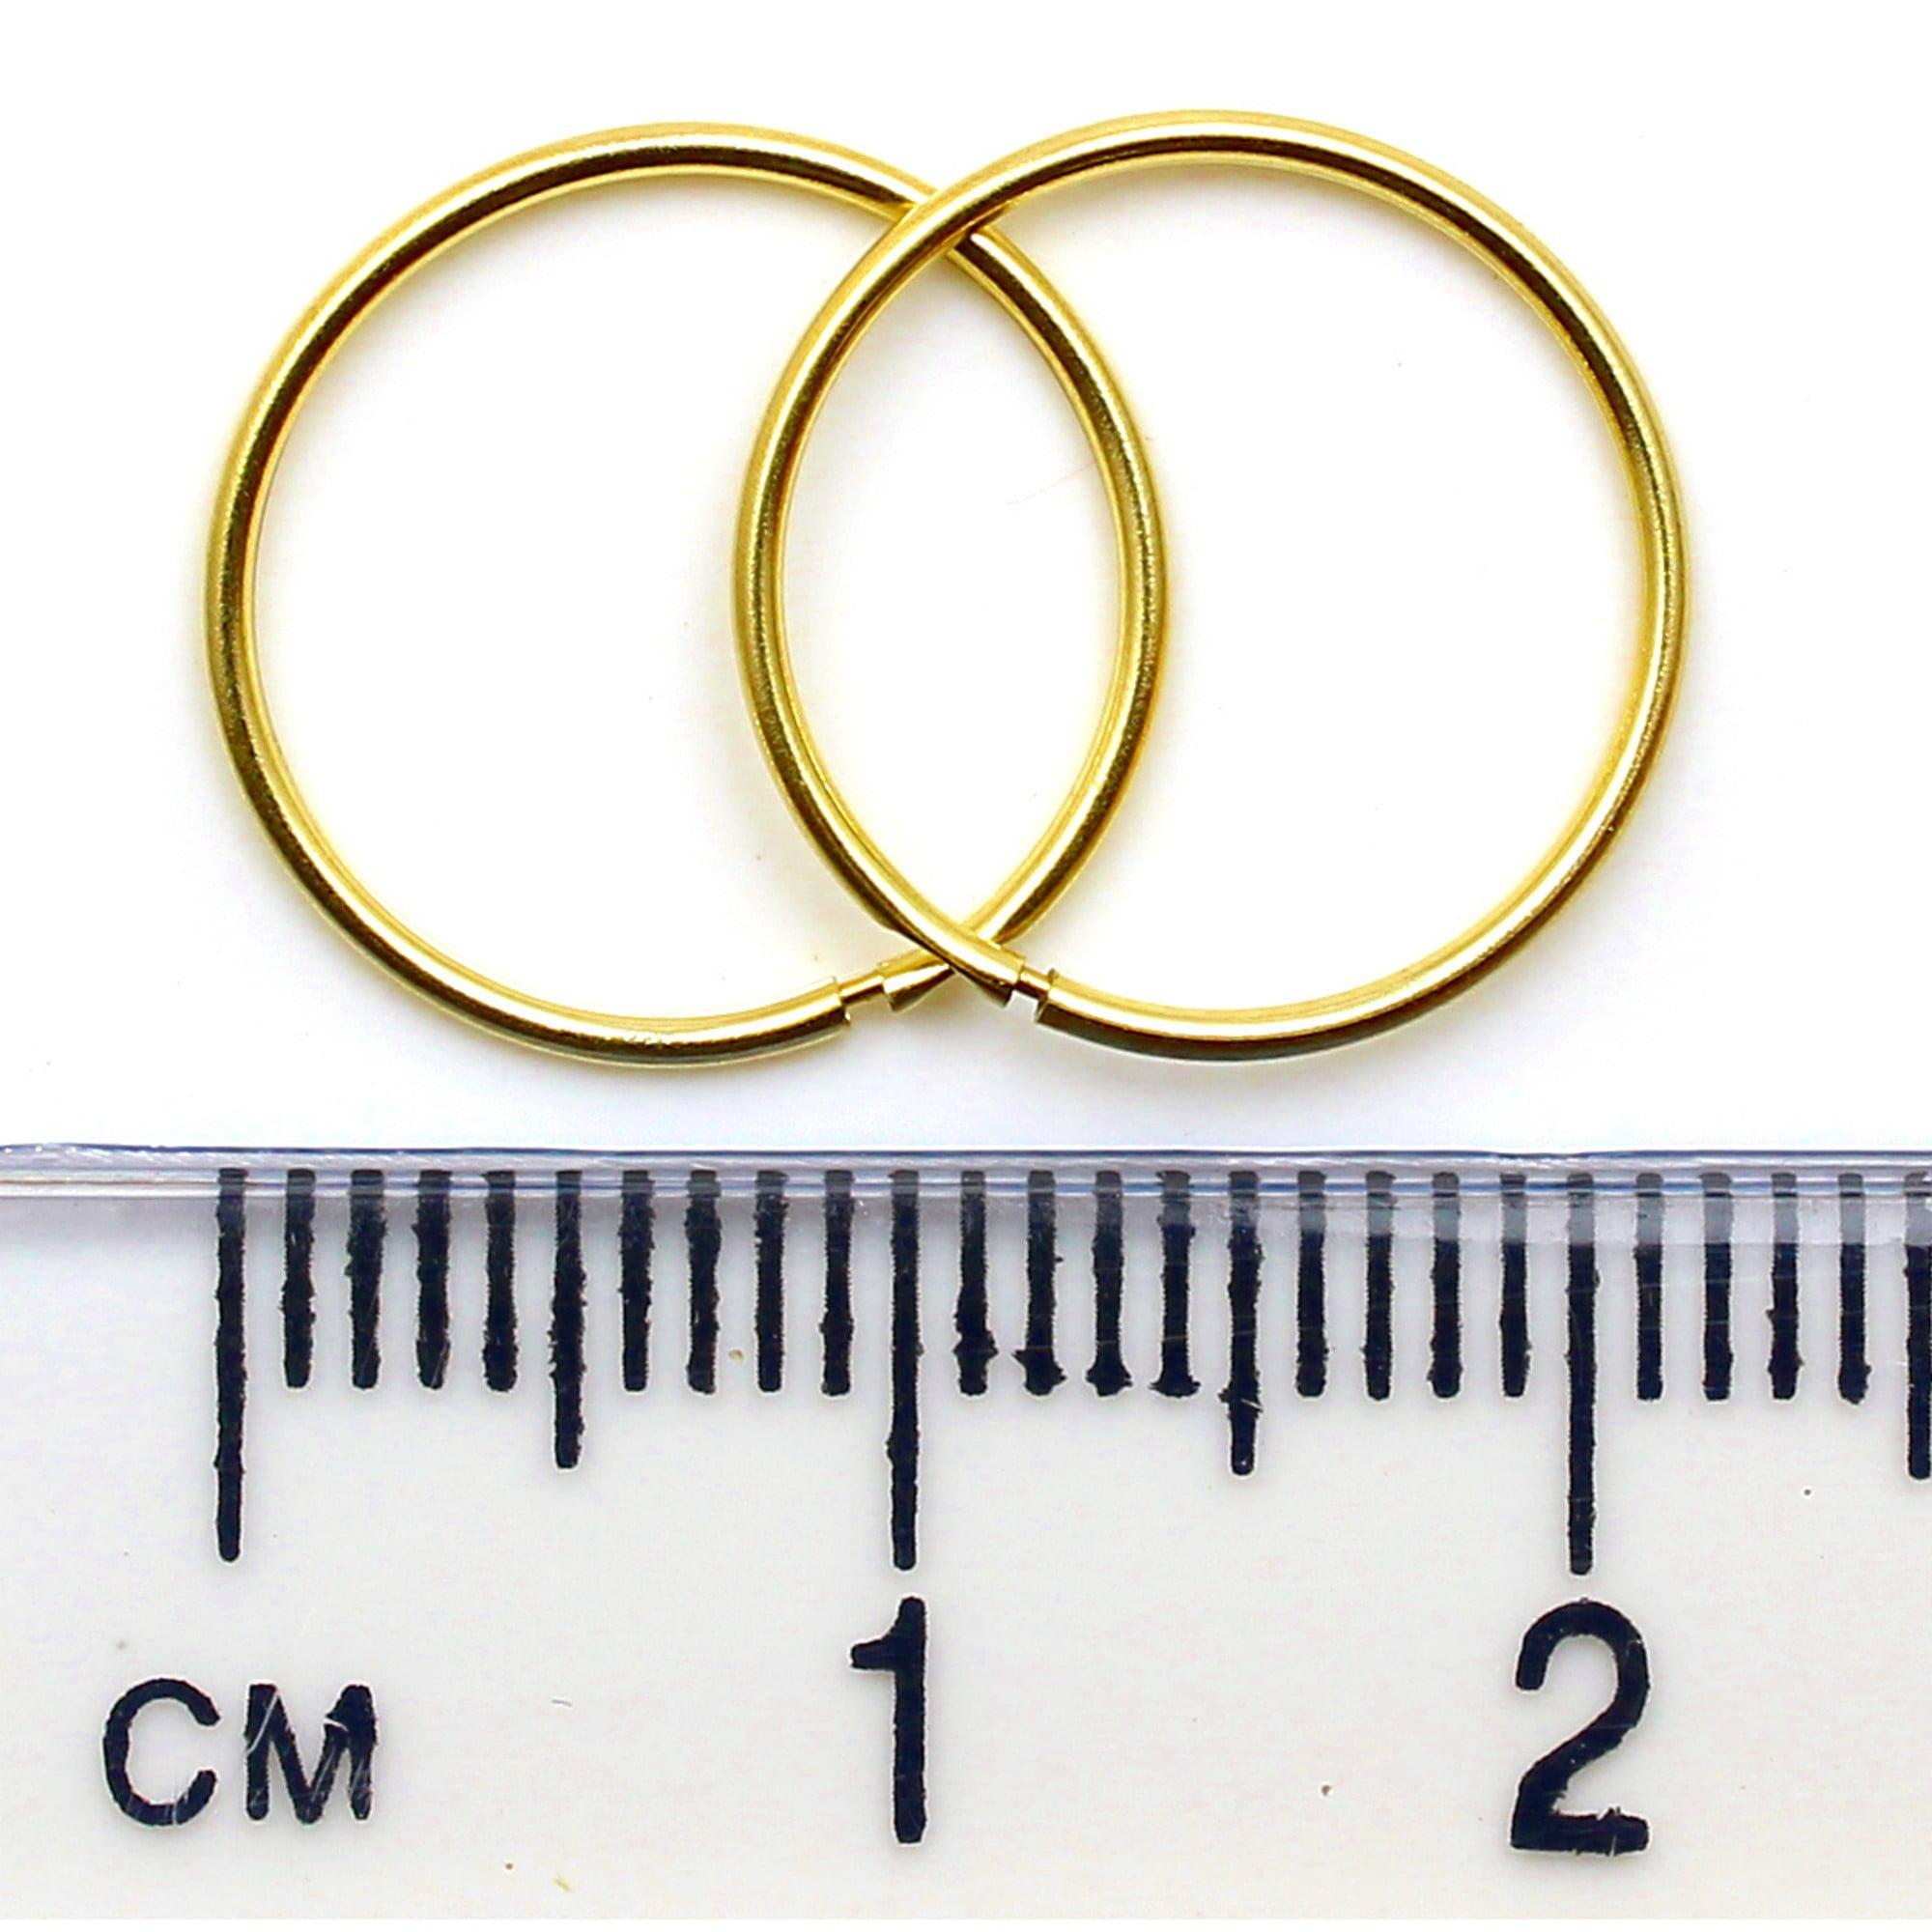 Arranview Jewellery 9ct Gold 10mm Plain Sleeper Hoops (1 Pair) RvwsYS